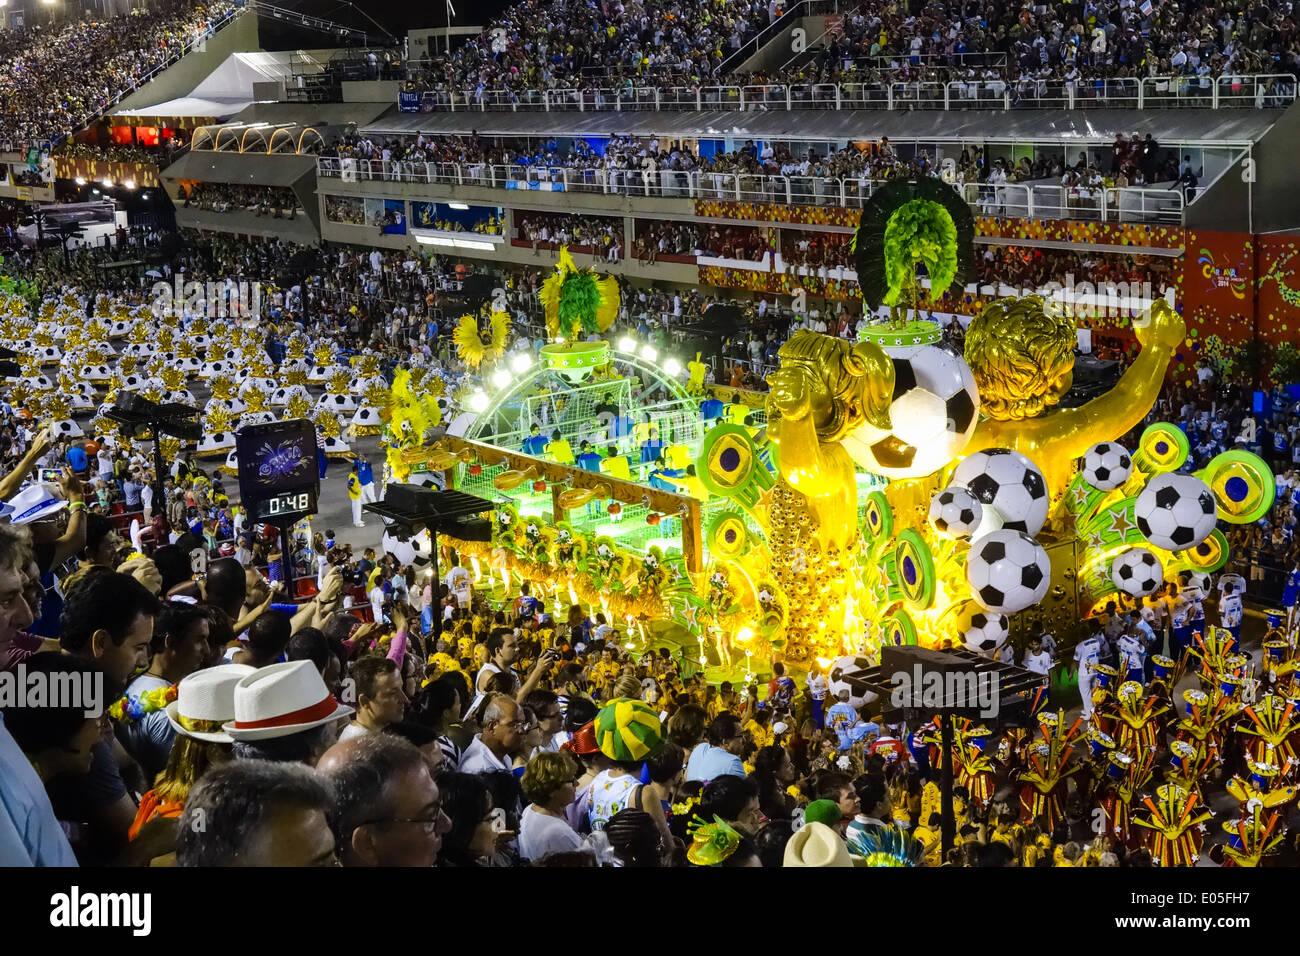 Brazil FIFA World Cup 2014 football world championship, Rio de Janeiro, Brazil - Stock Image